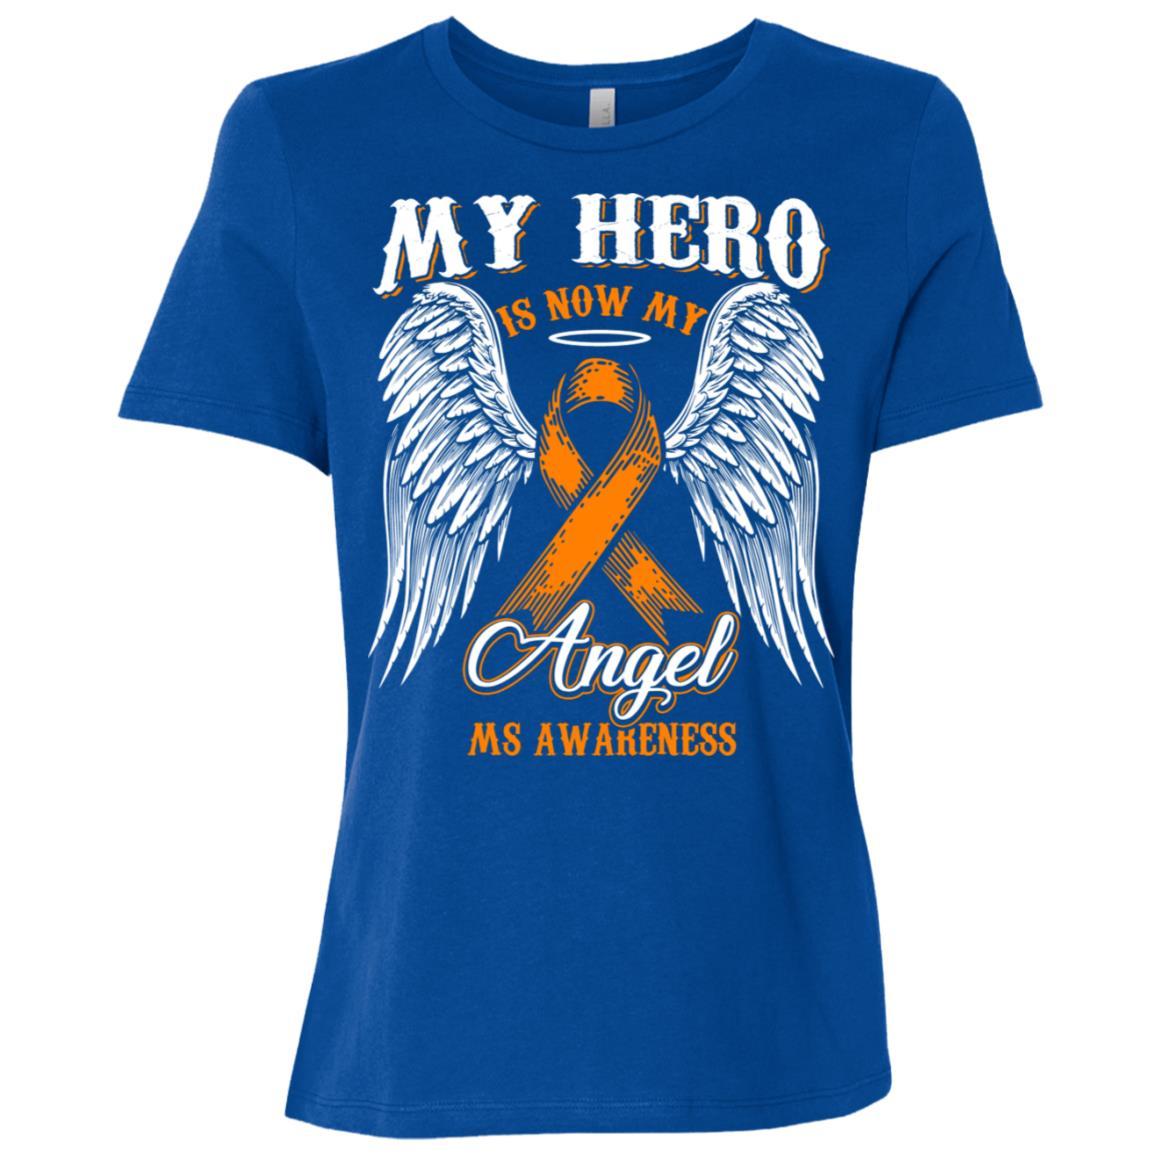 My Hero Is Now My Angel Ms Awareness Women Short Sleeve T-Shirt